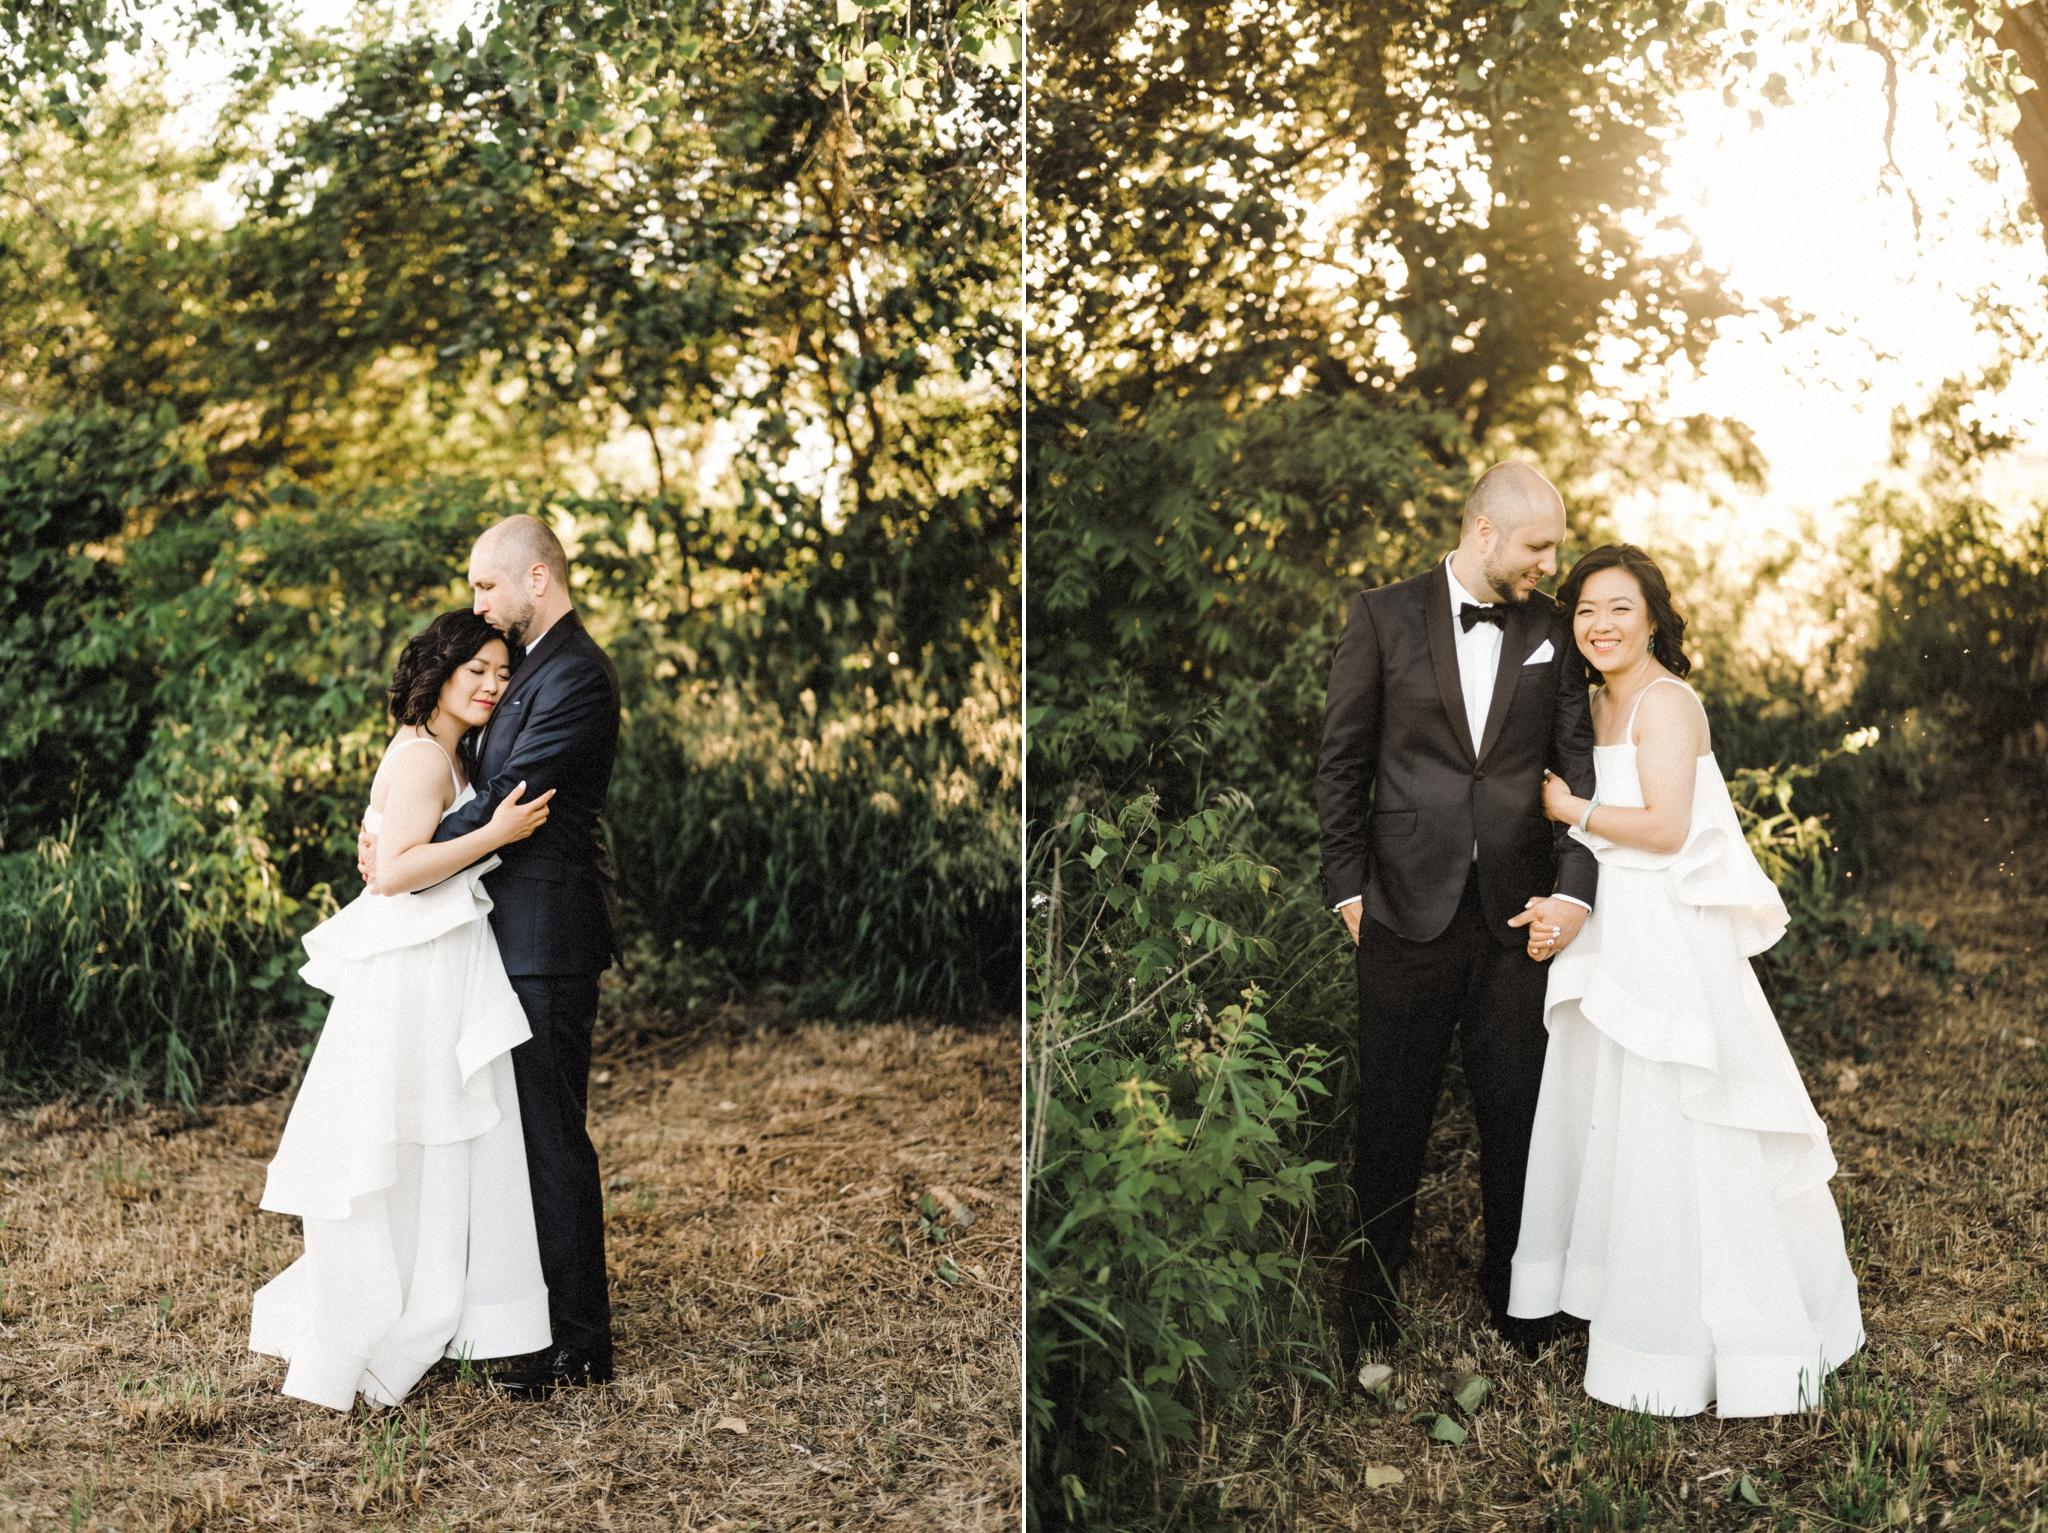 Illinois_backyard_wedding_0019.jpg